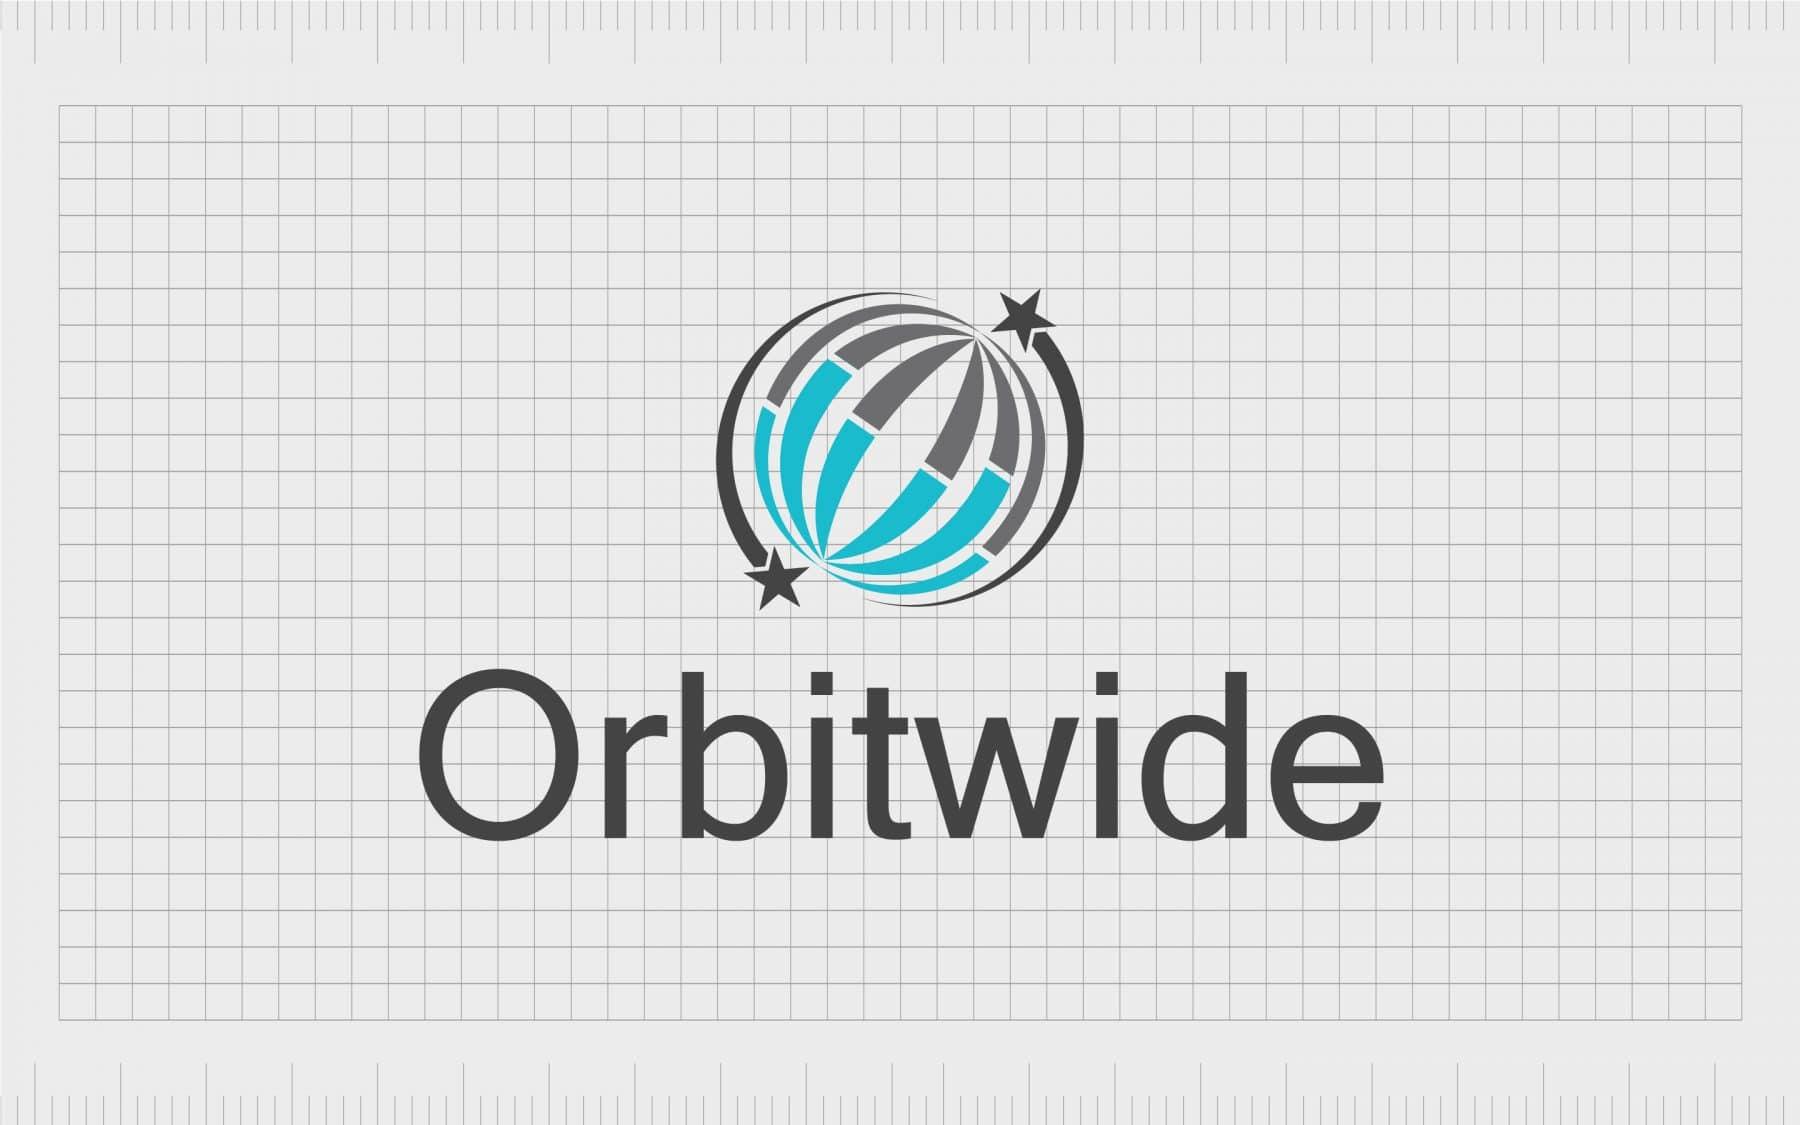 Orbitwide